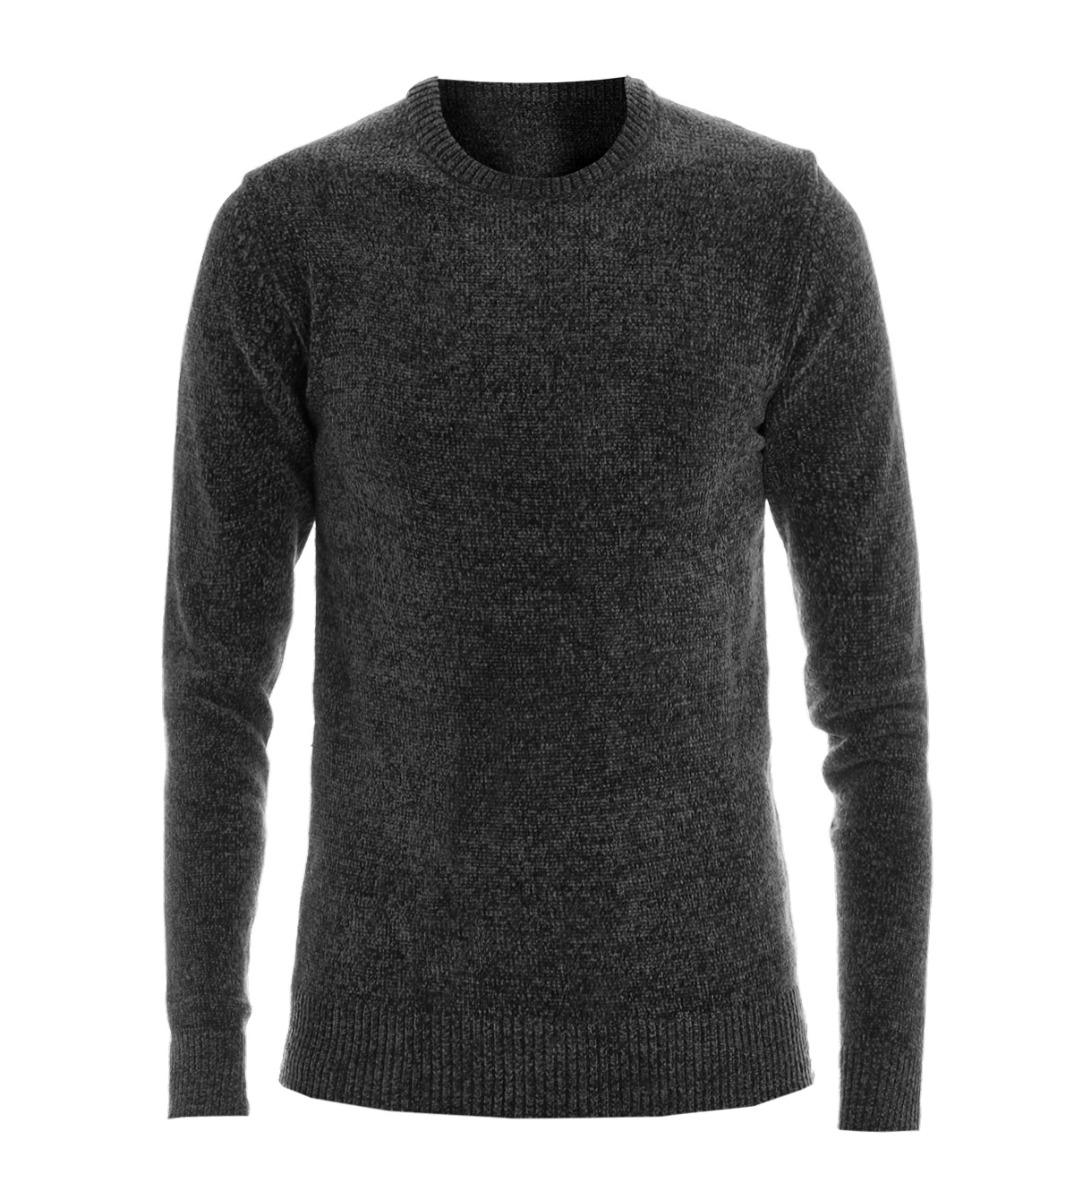 Pullover Pullover Einfarbig Herren Slim Pullover Melange